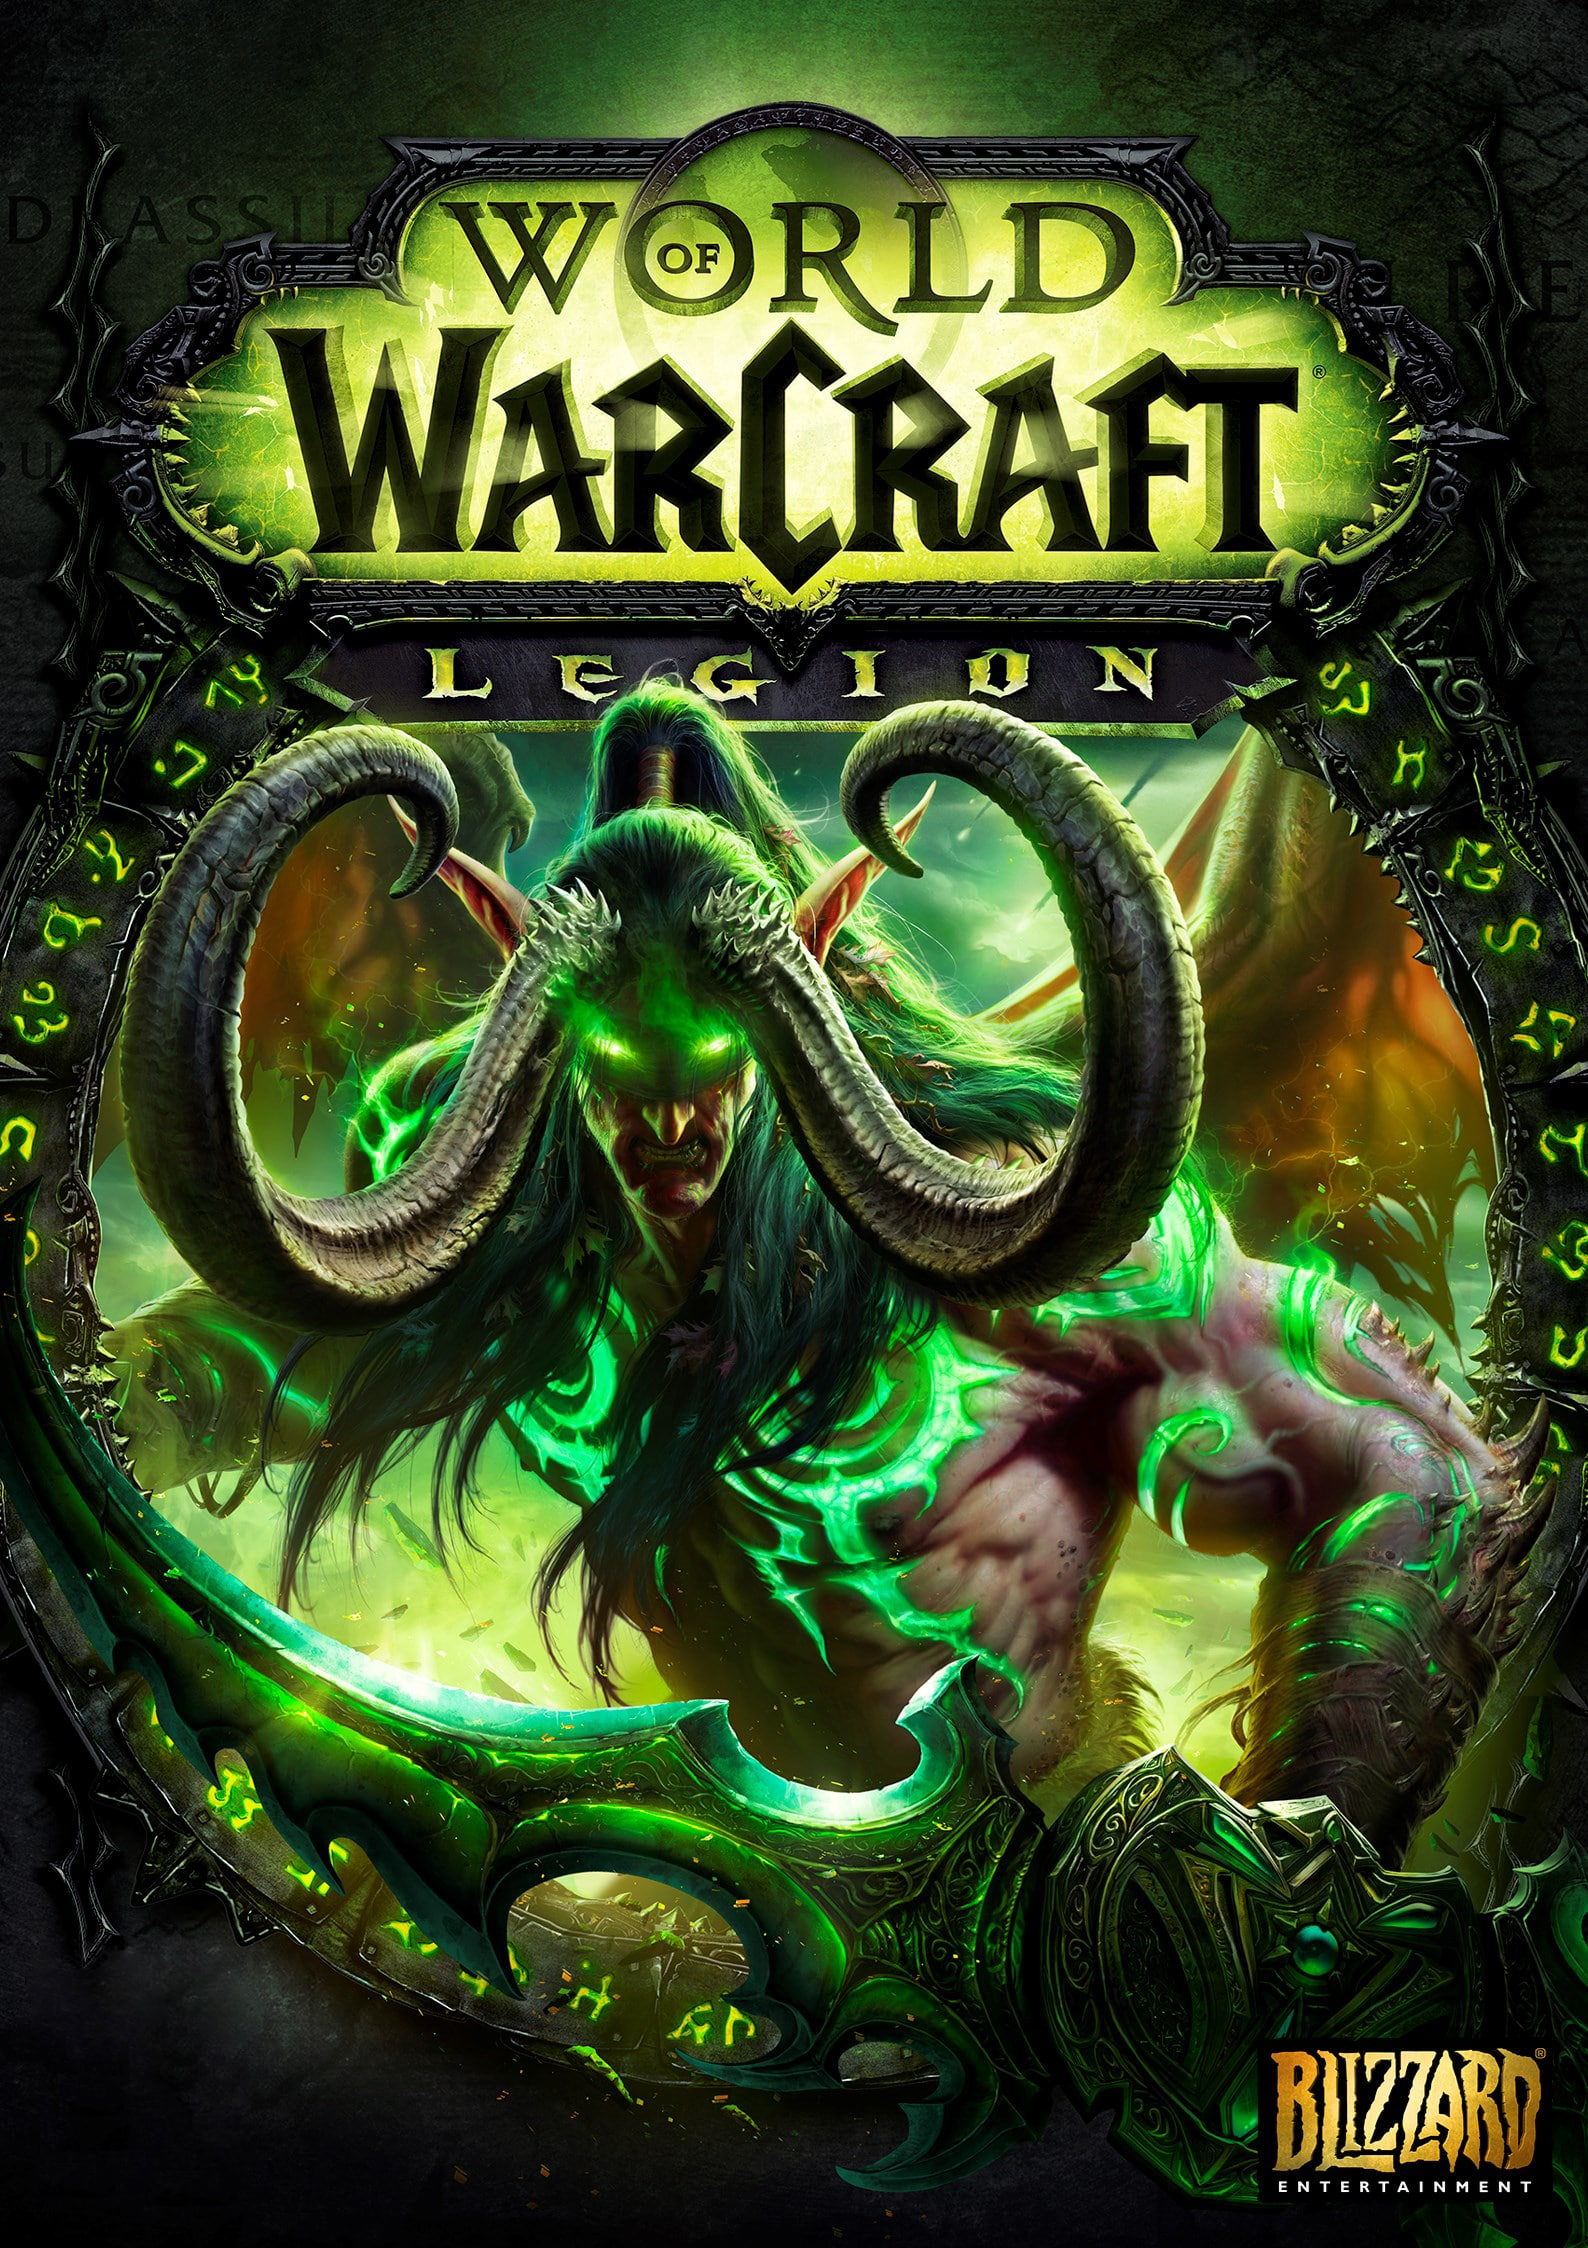 World of Warcraft: Legion For mobile